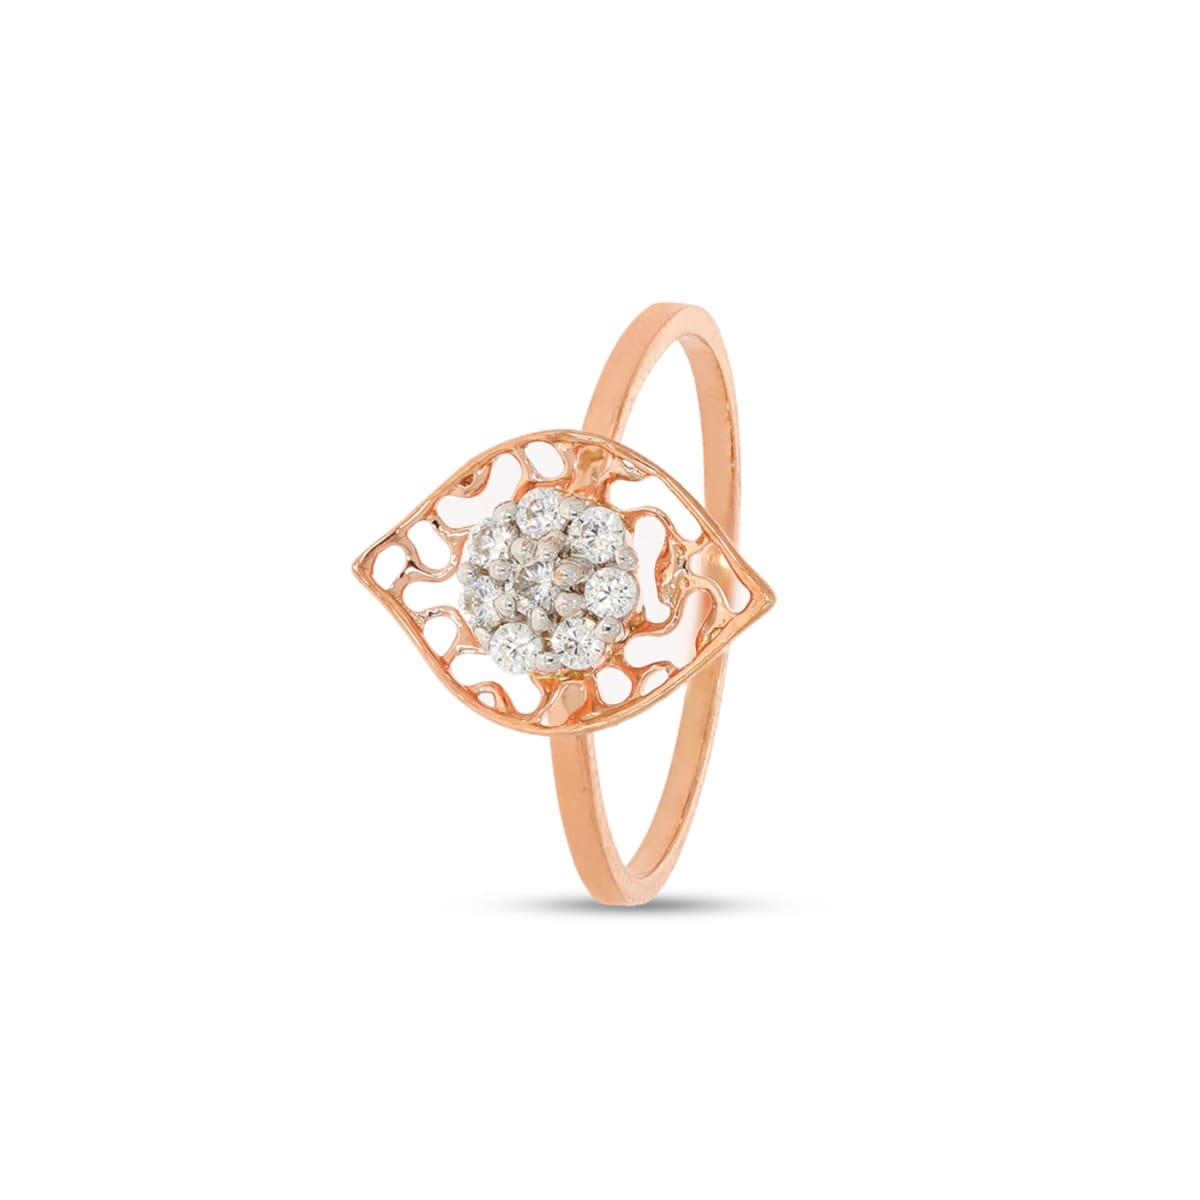 Real Diamond Ring 37